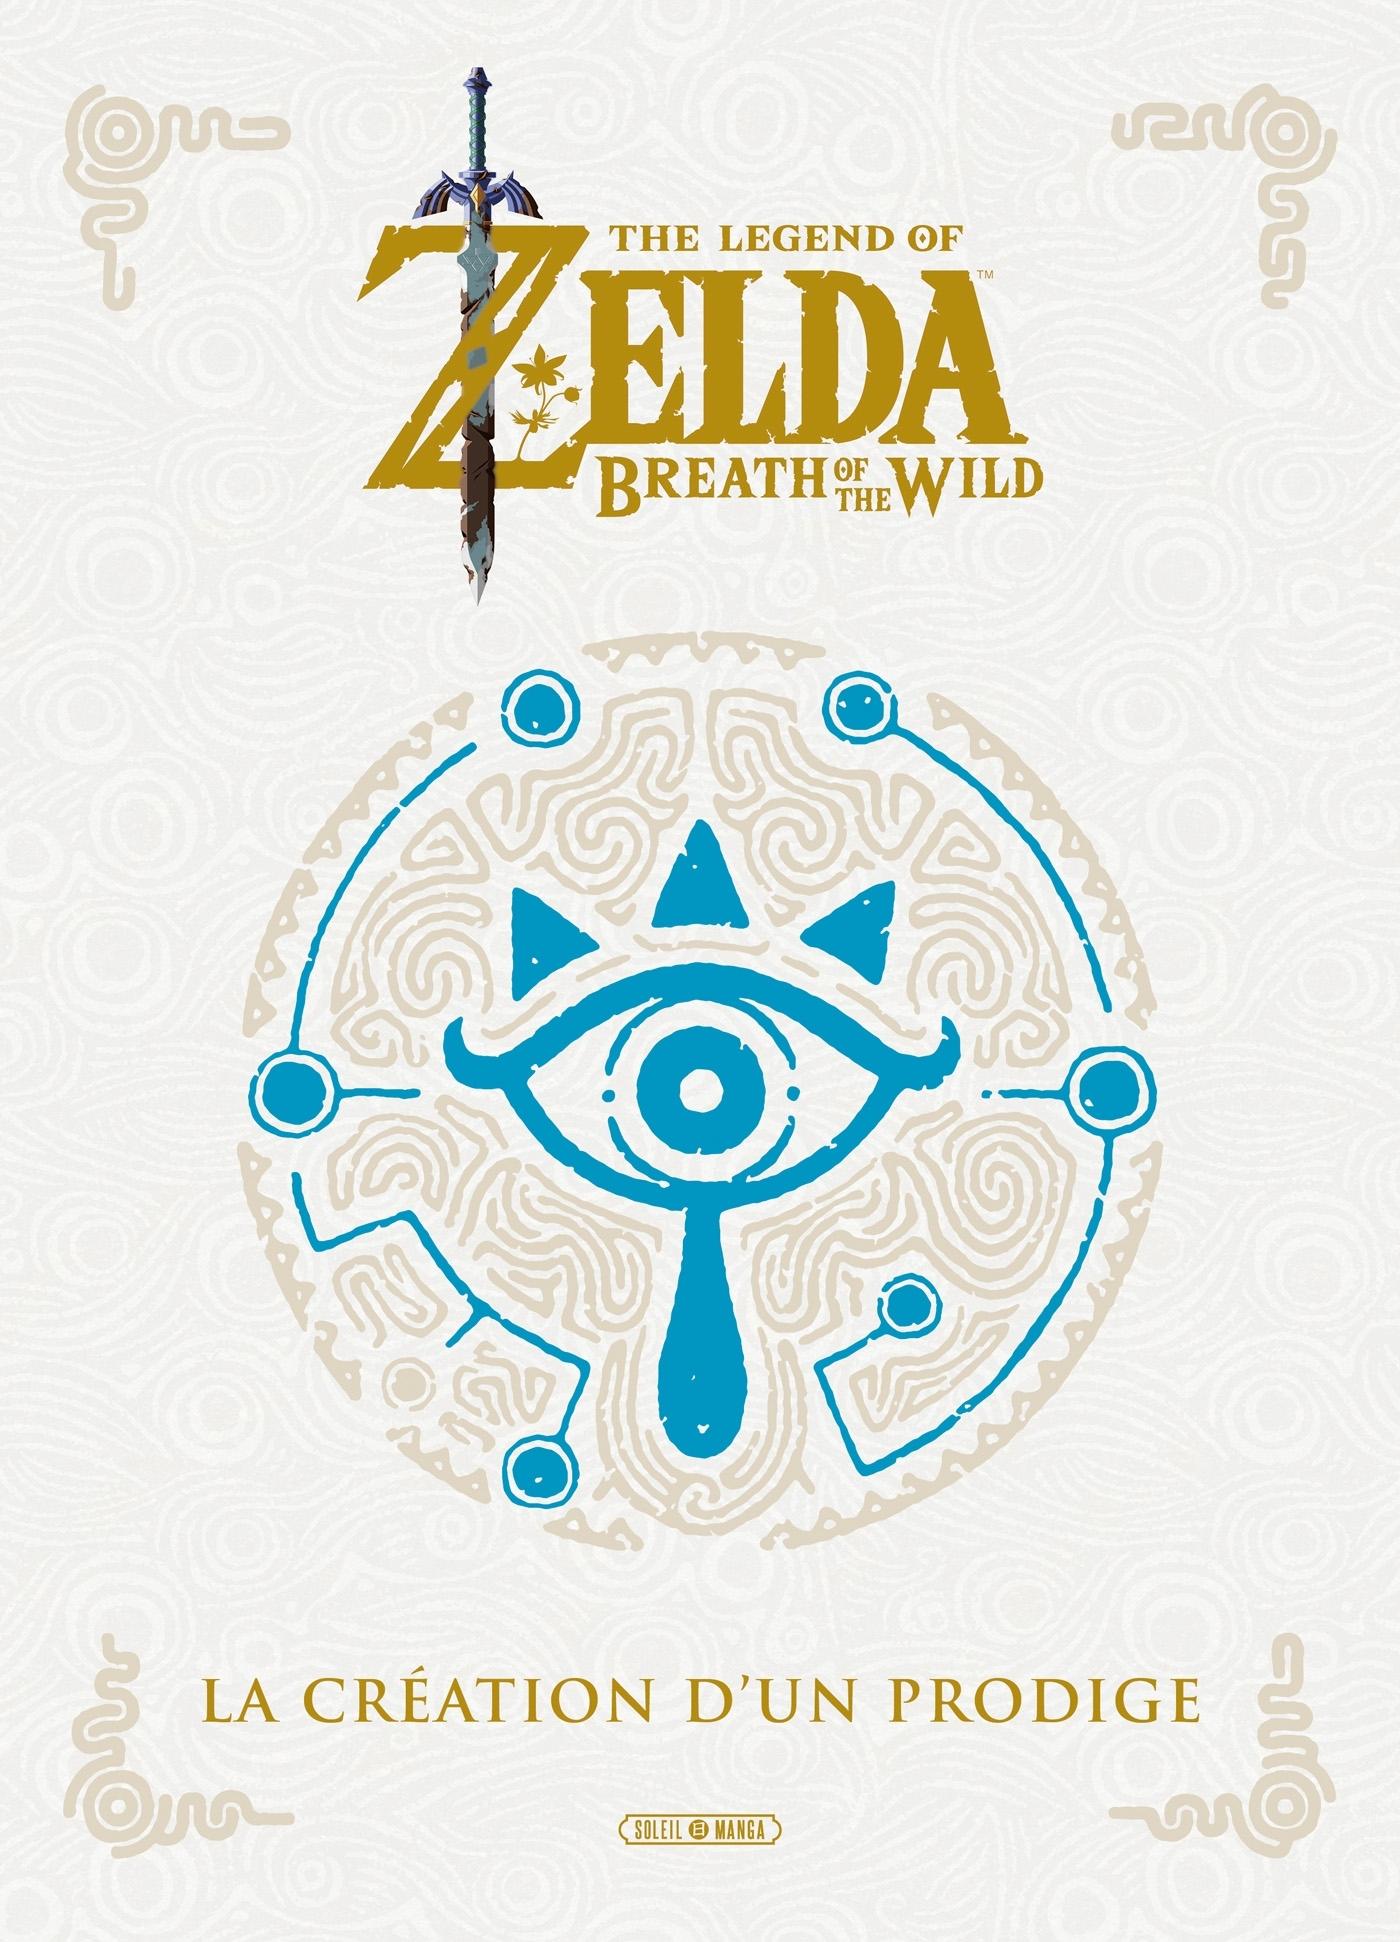 THE LEGEND OF ZELDA - BEAUX LIVRES - ONE-SHOT - THE LEGEND OF ZELDA -  BREATH OF THE WILD - LA CREAT